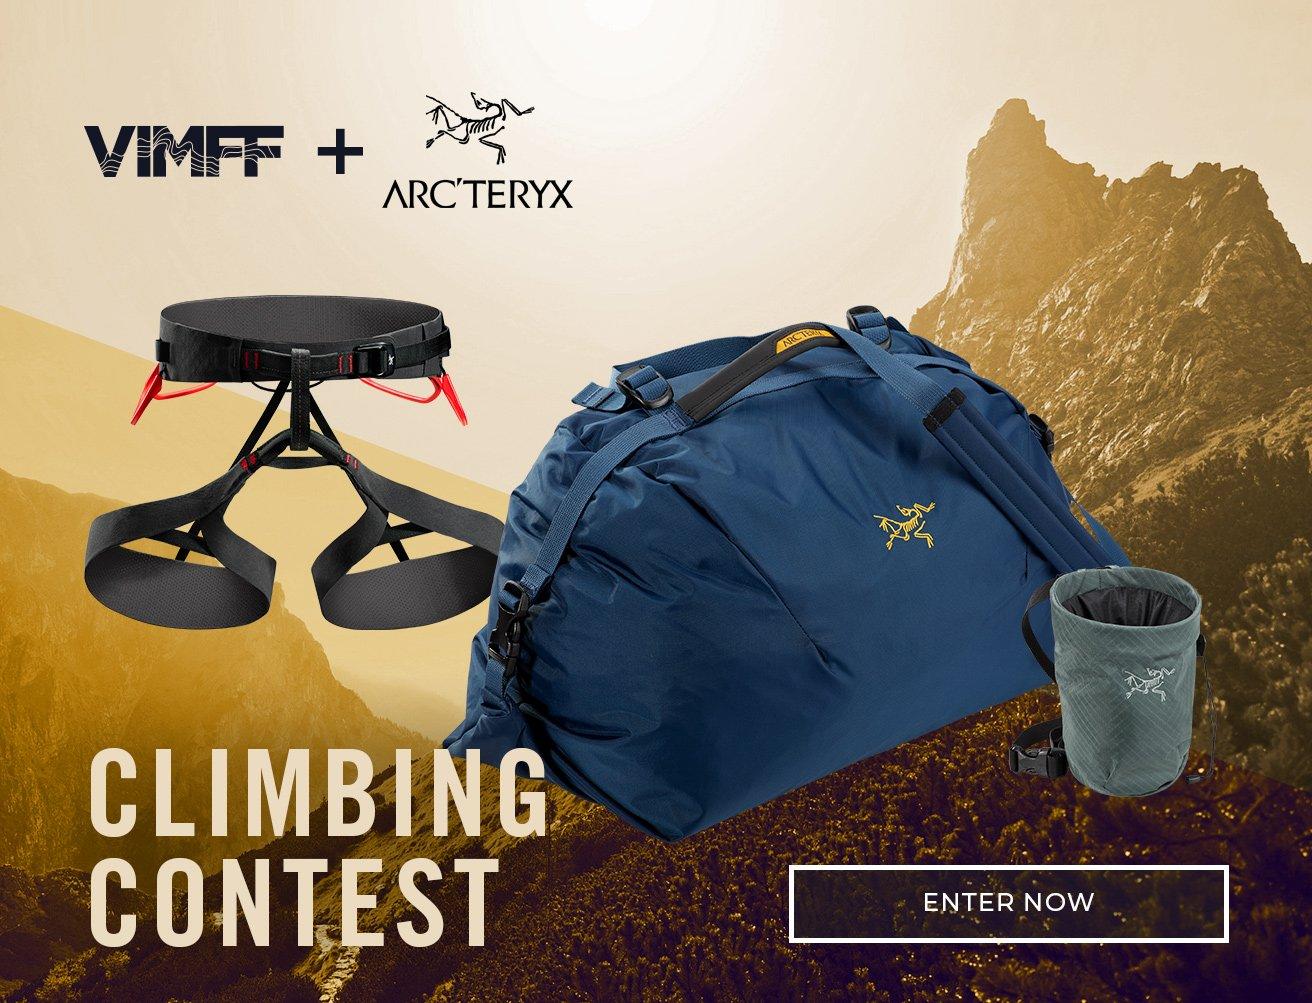 vimff climbing contest cta